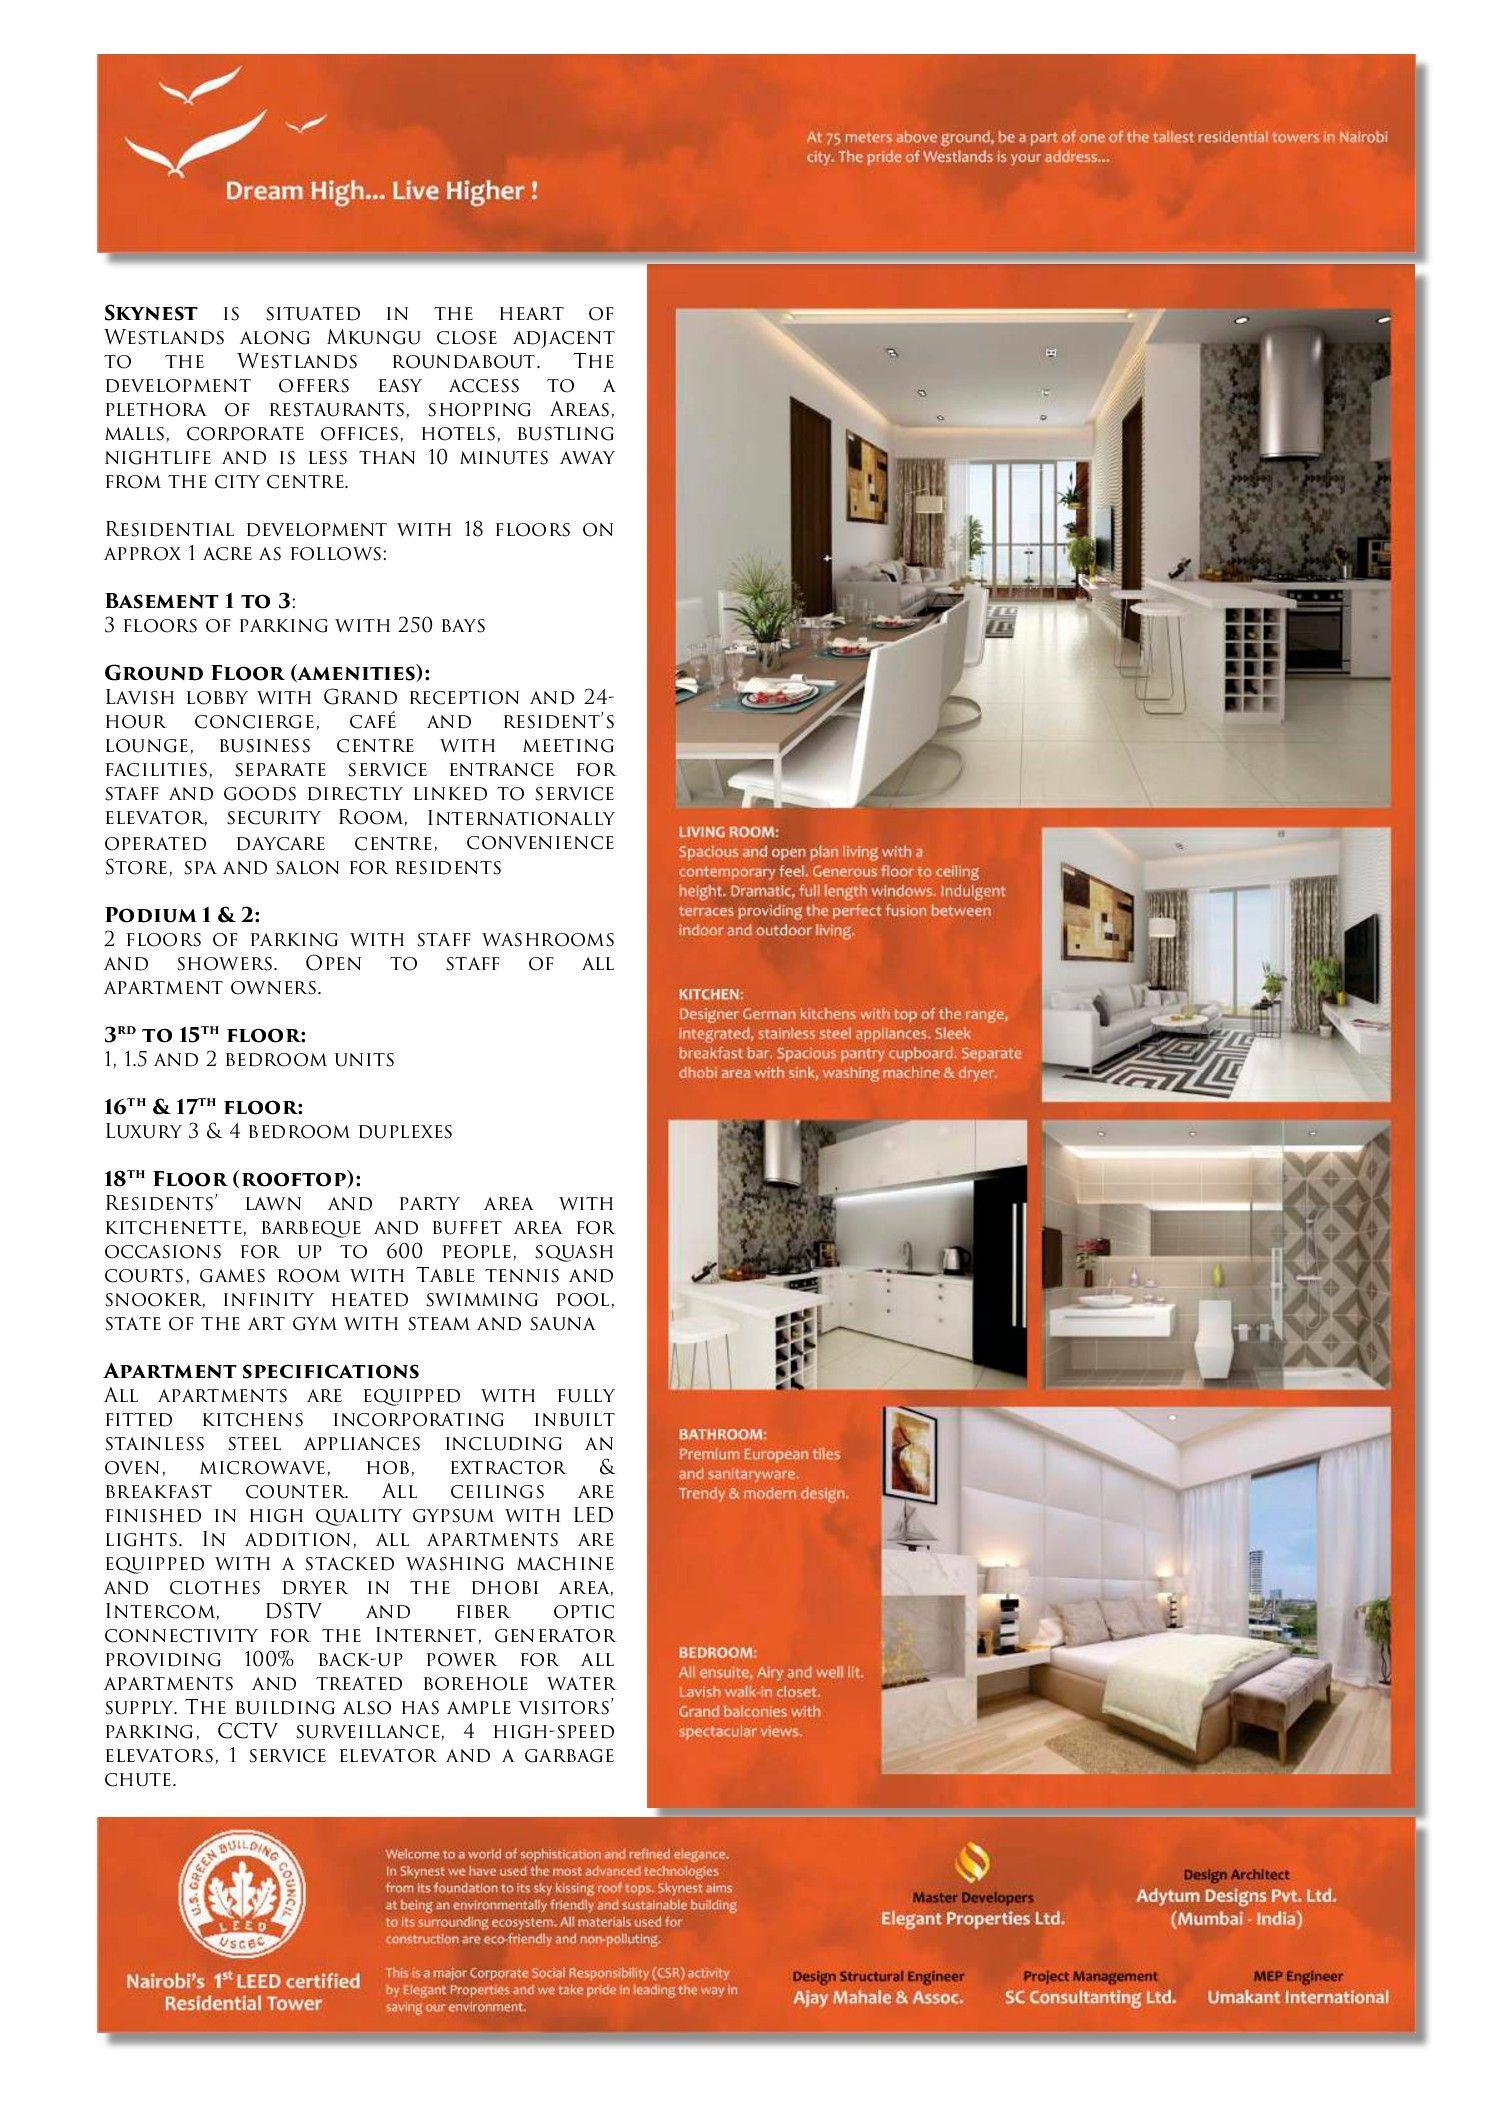 Elegant properties elegantkenya on pinterest